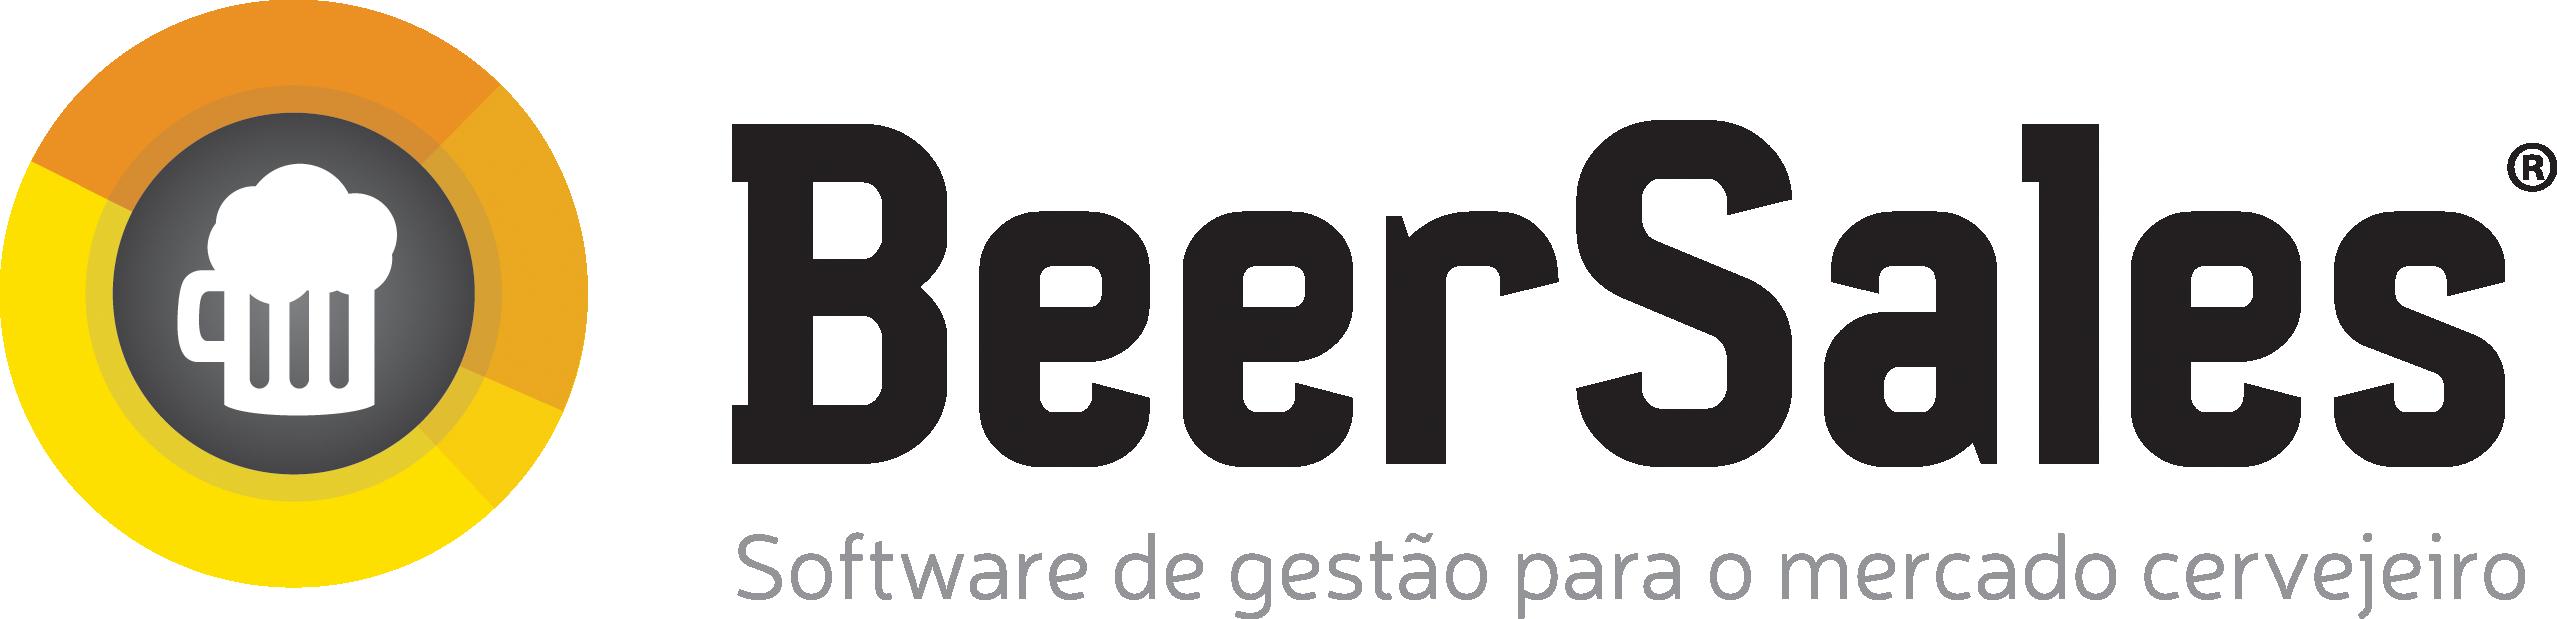 Logo da empresa BeerSales.